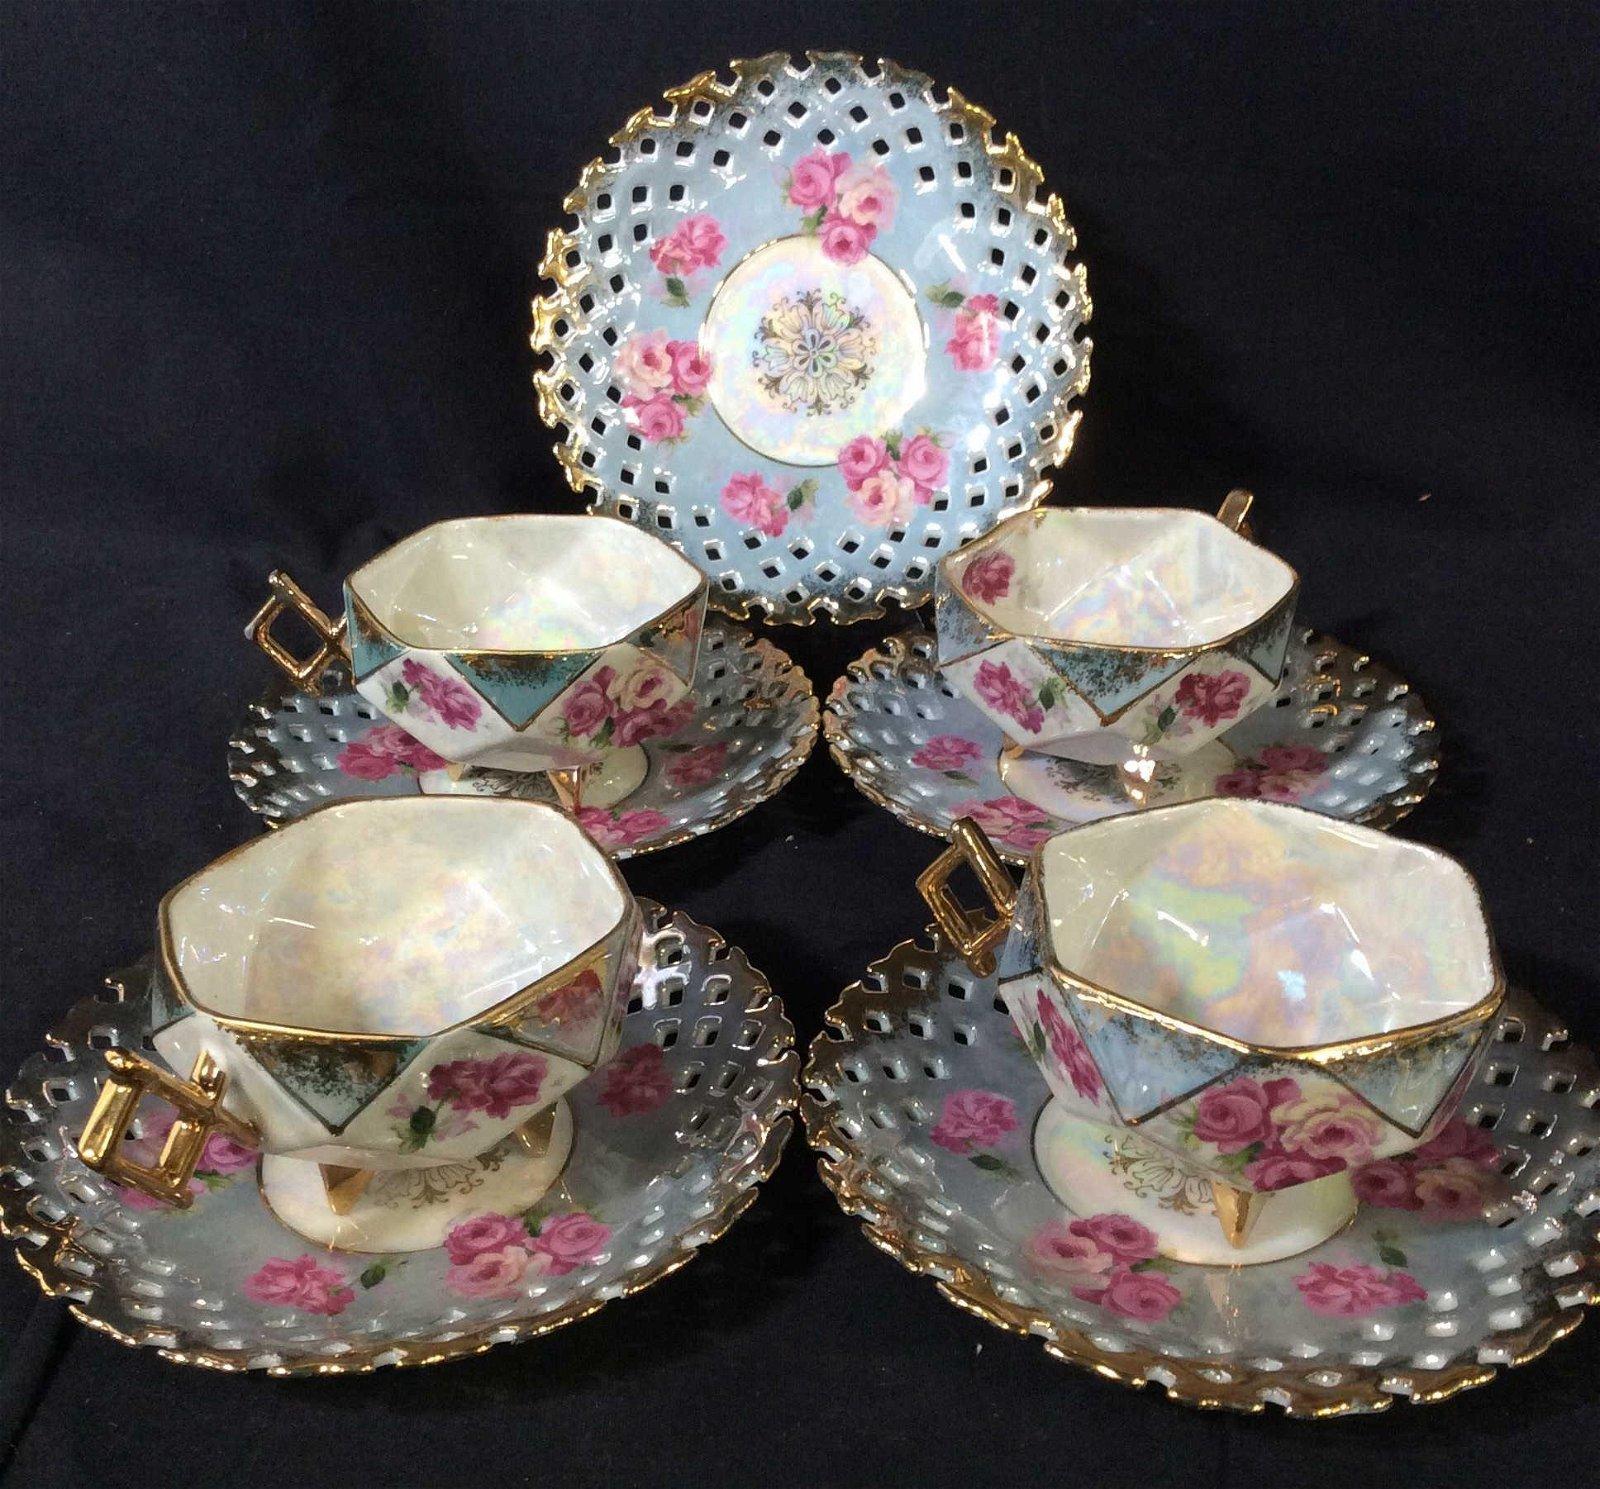 Set 9 Royal Halsey Fine Lusterware Tea Service